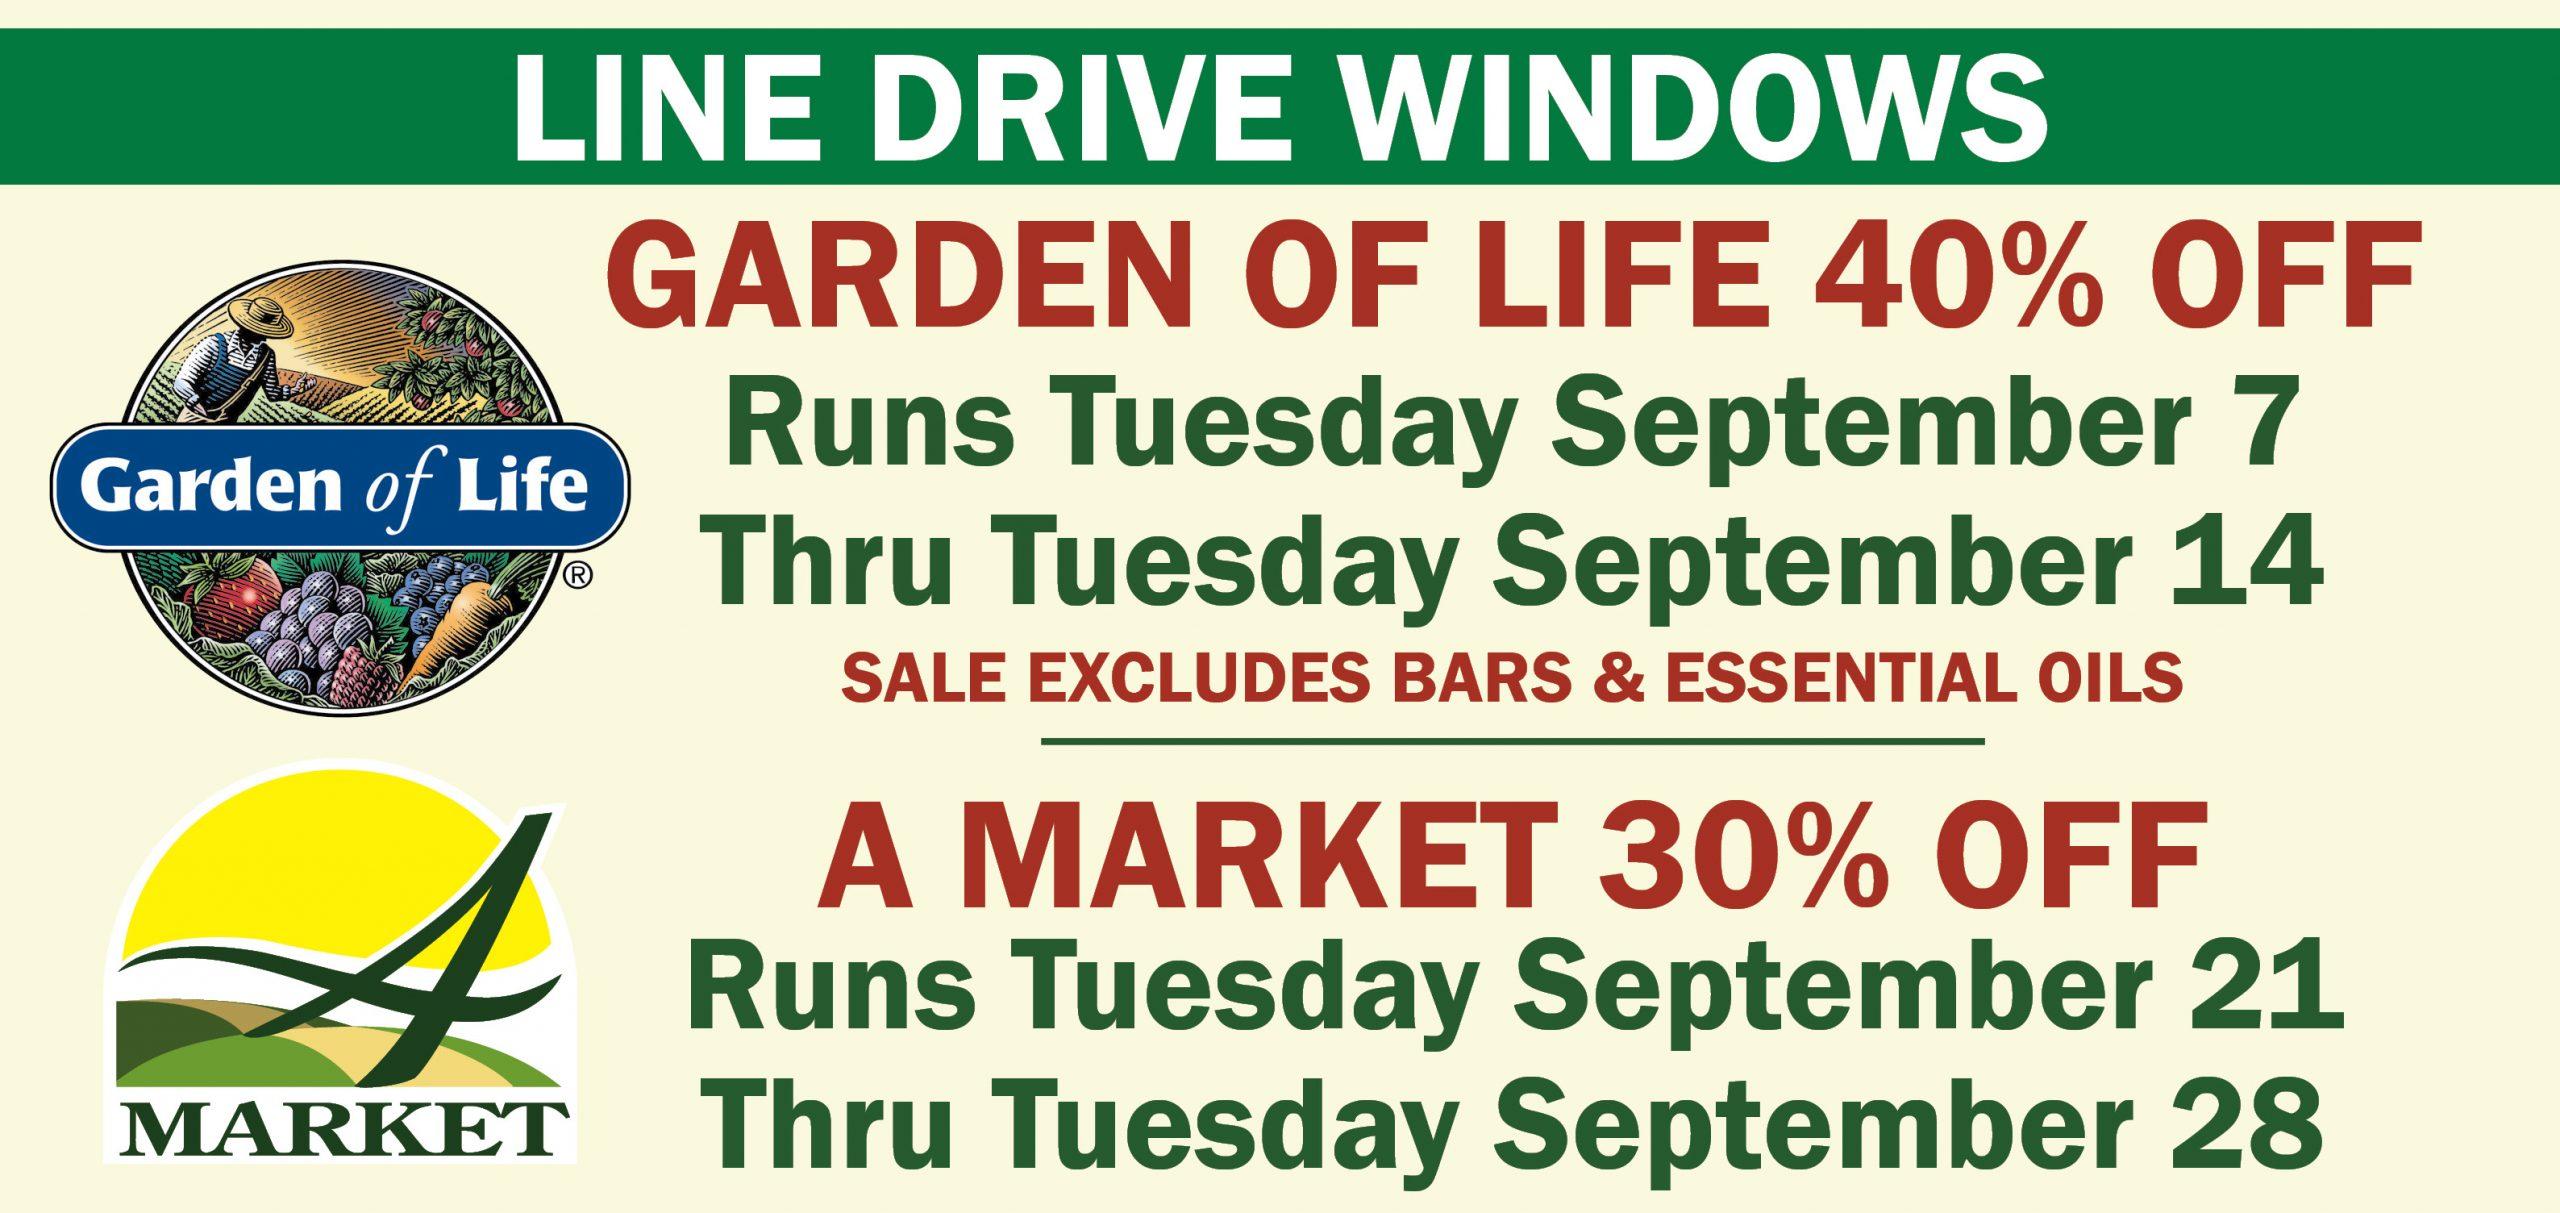 Line Drive Windows